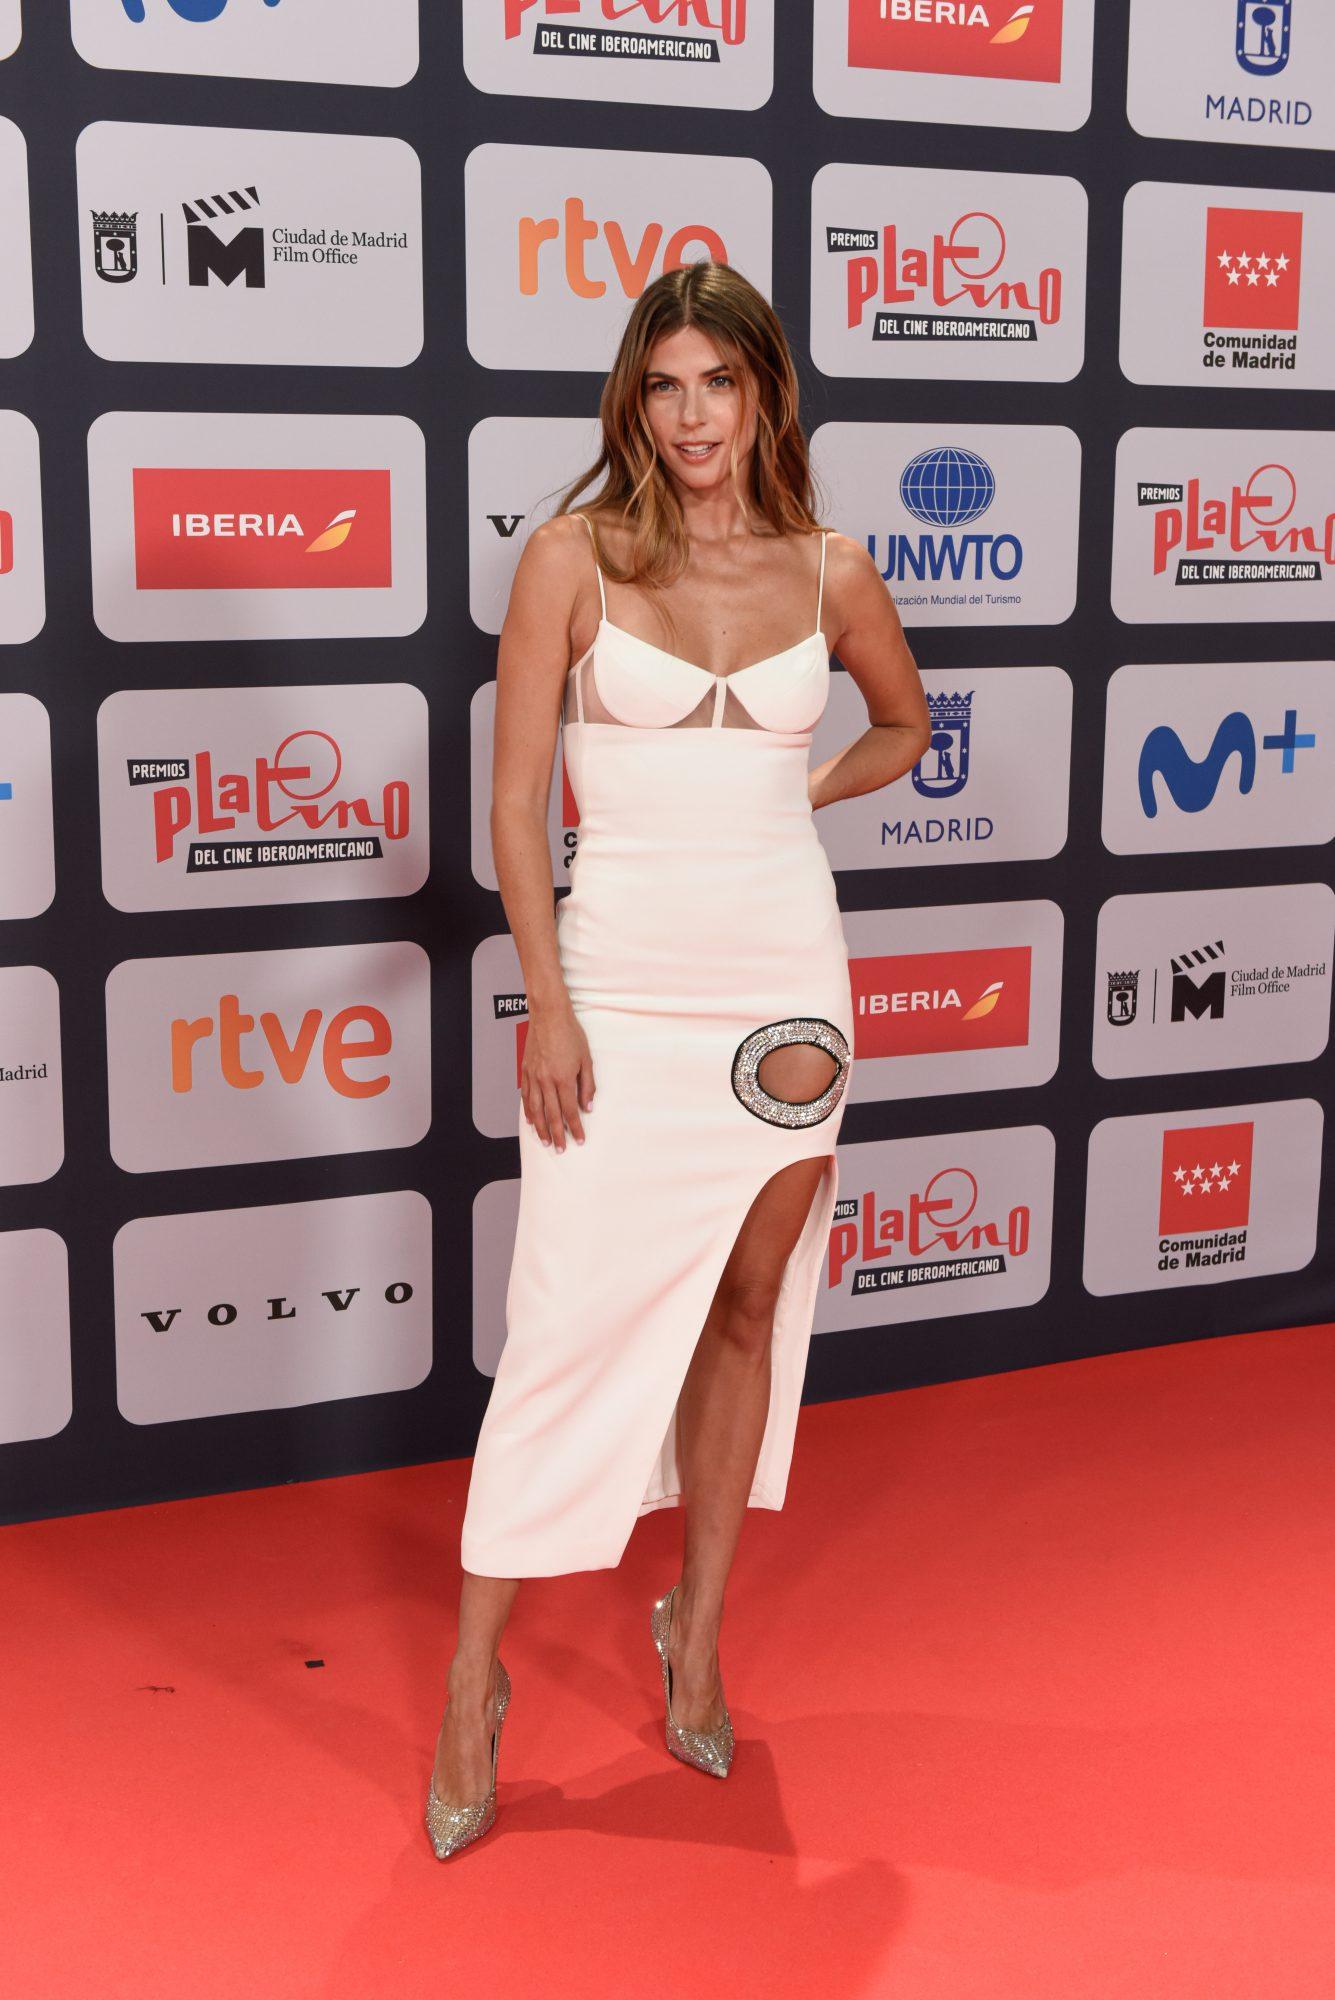 Mejores looks Premios Platino